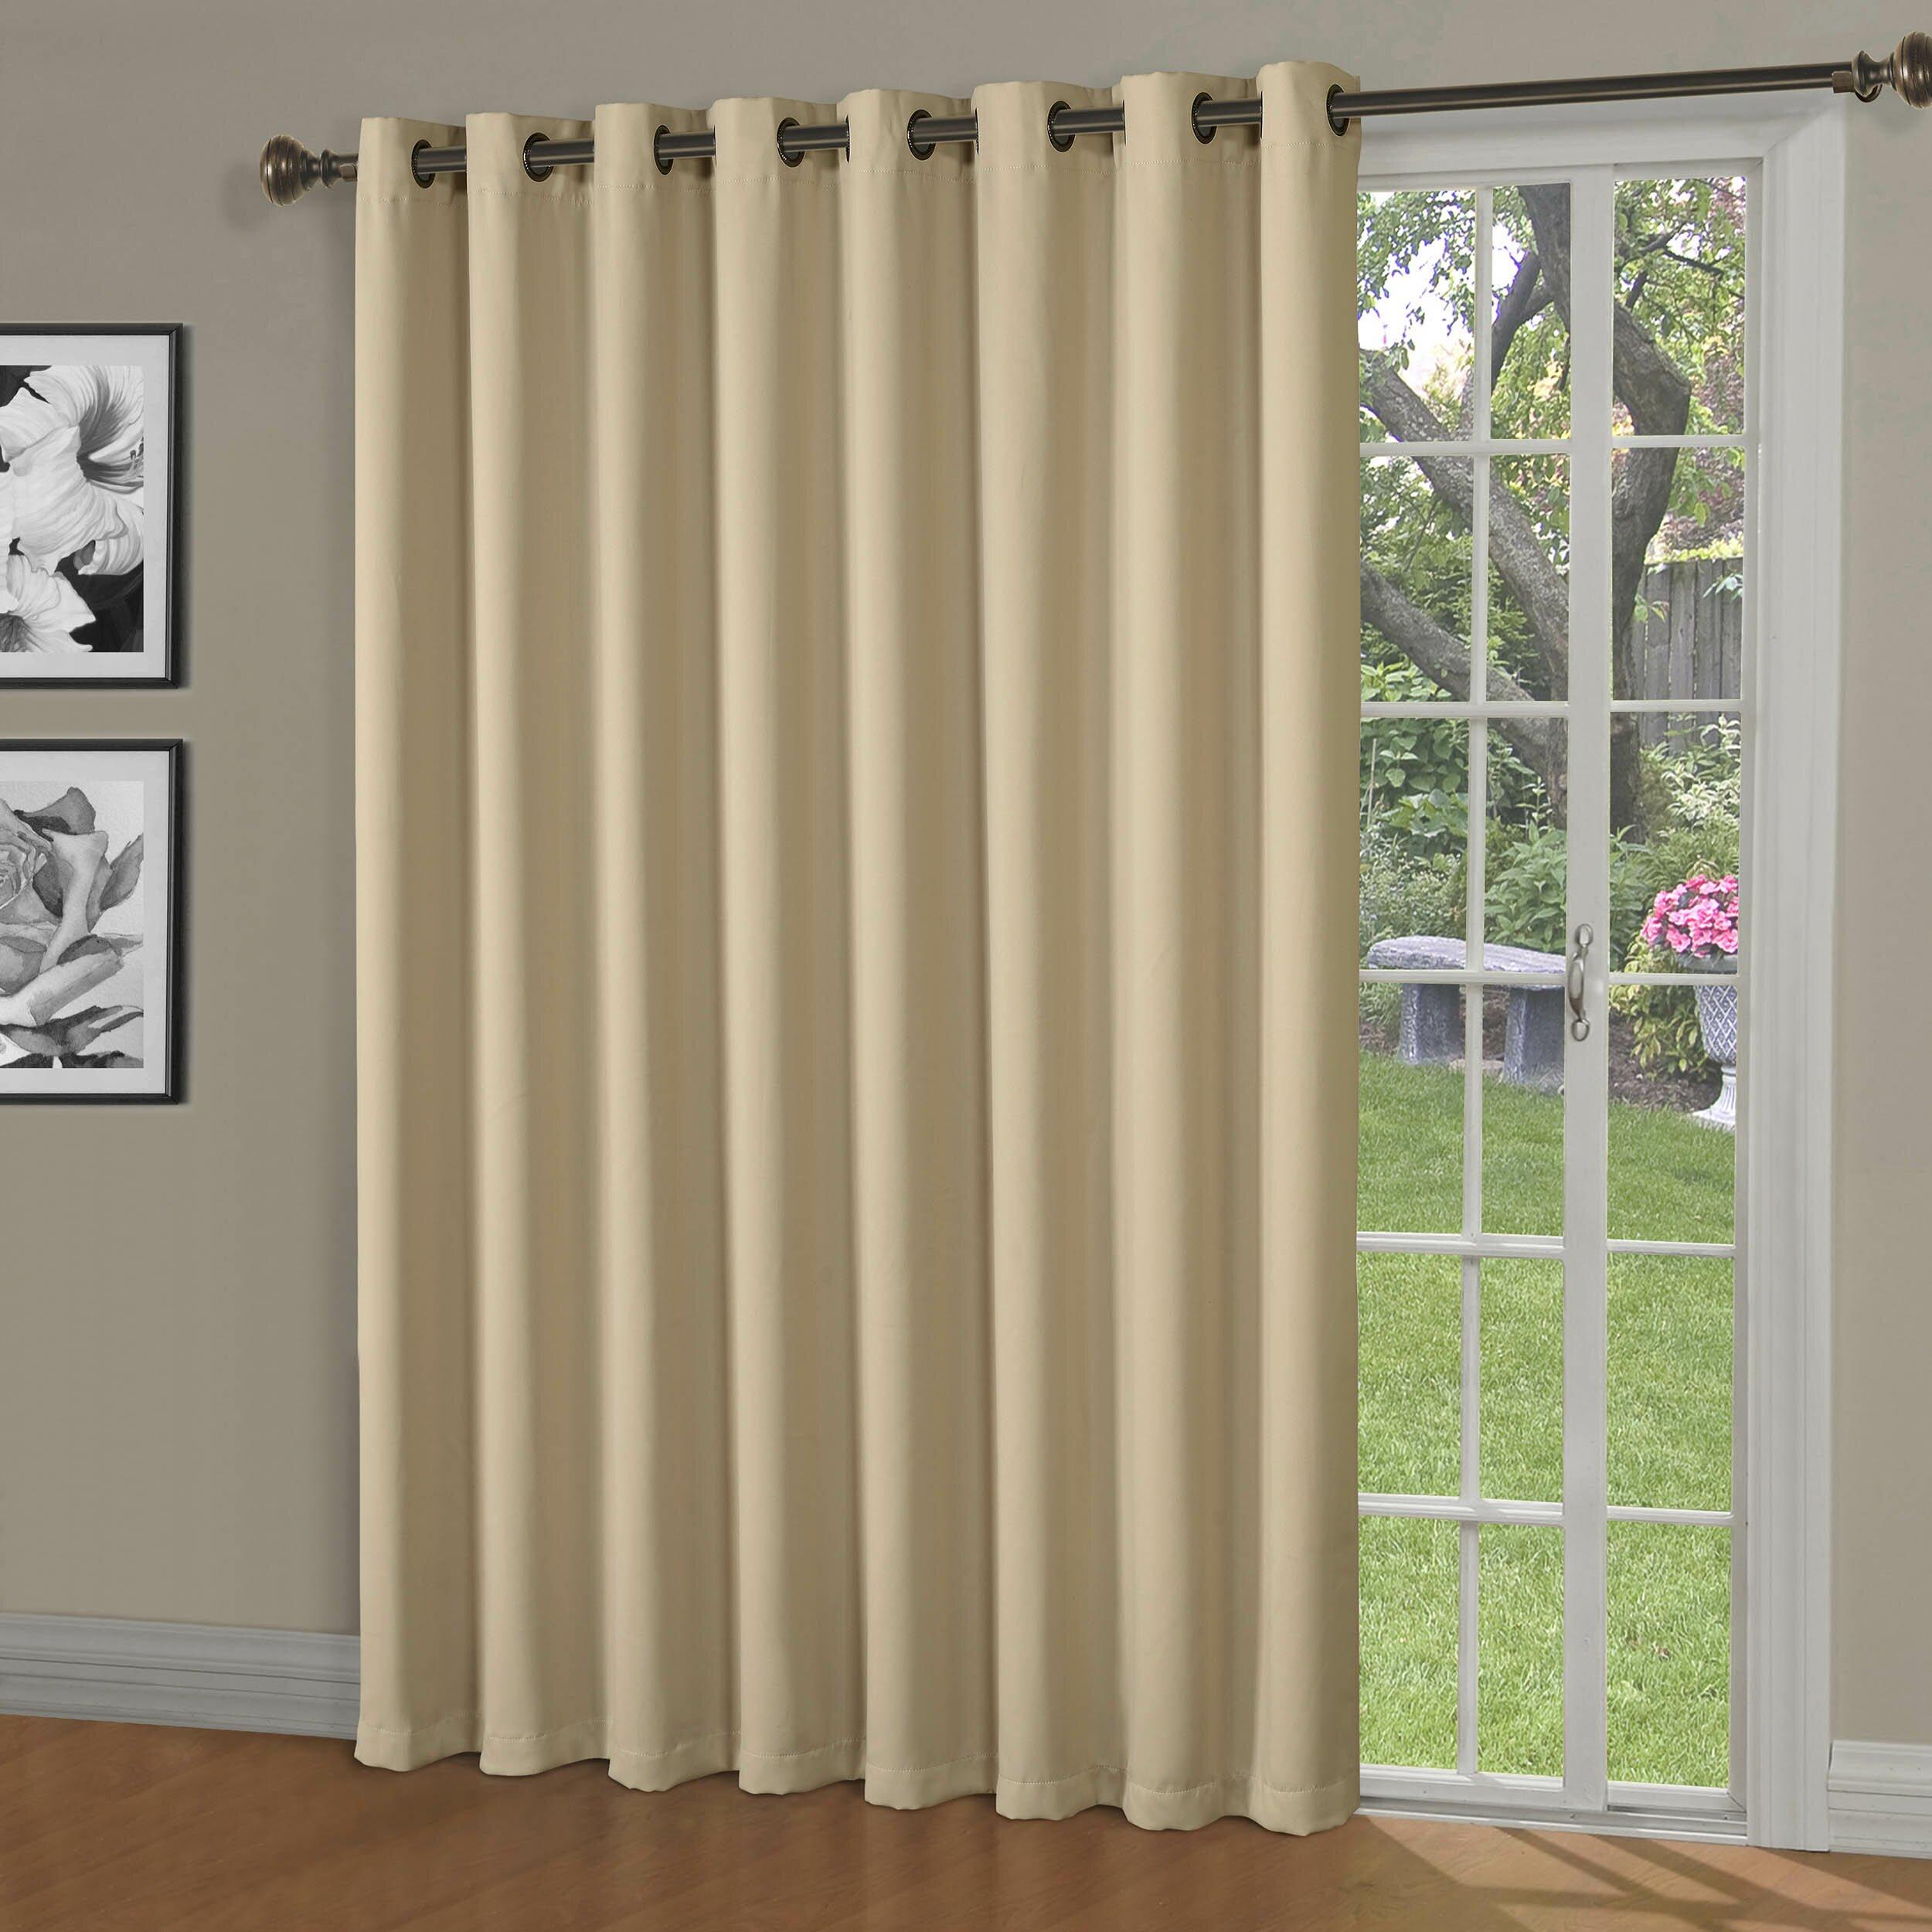 Filename: Maya+Thermal+Blackout+Grommet+Patio+Door+Single+Curtain+Panel